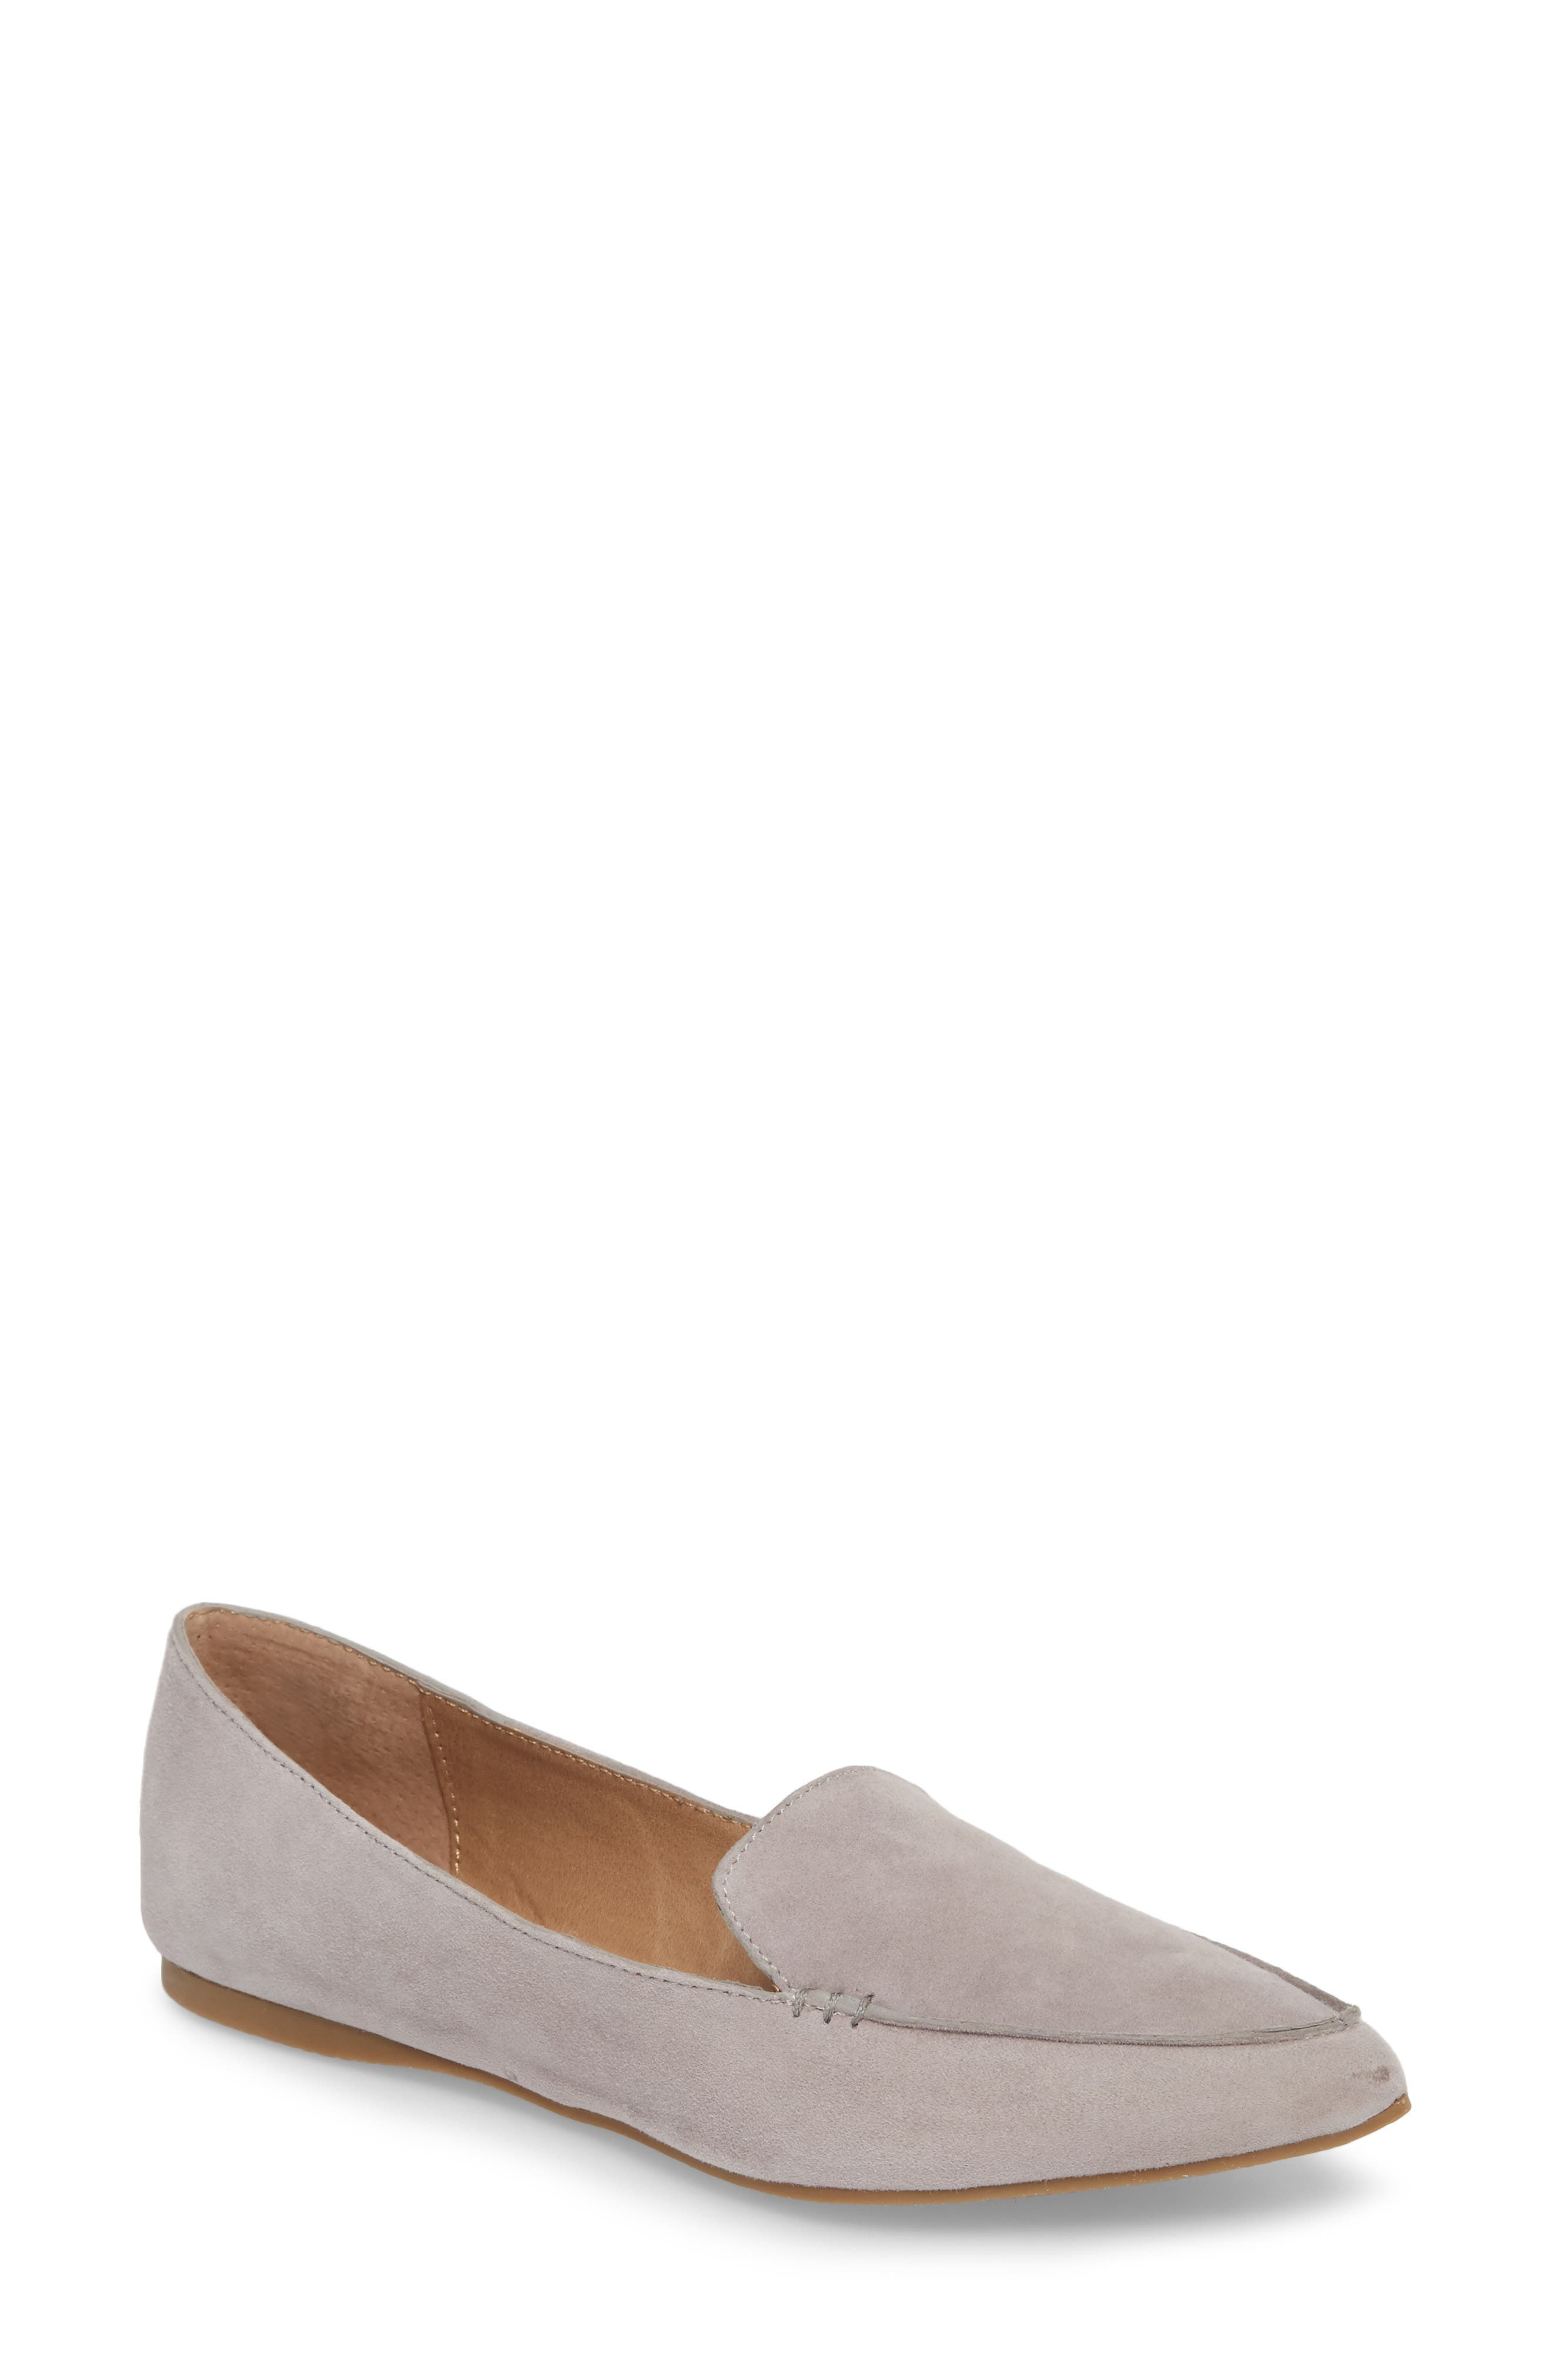 Steve Madden Feather Loafer Flat (Women)